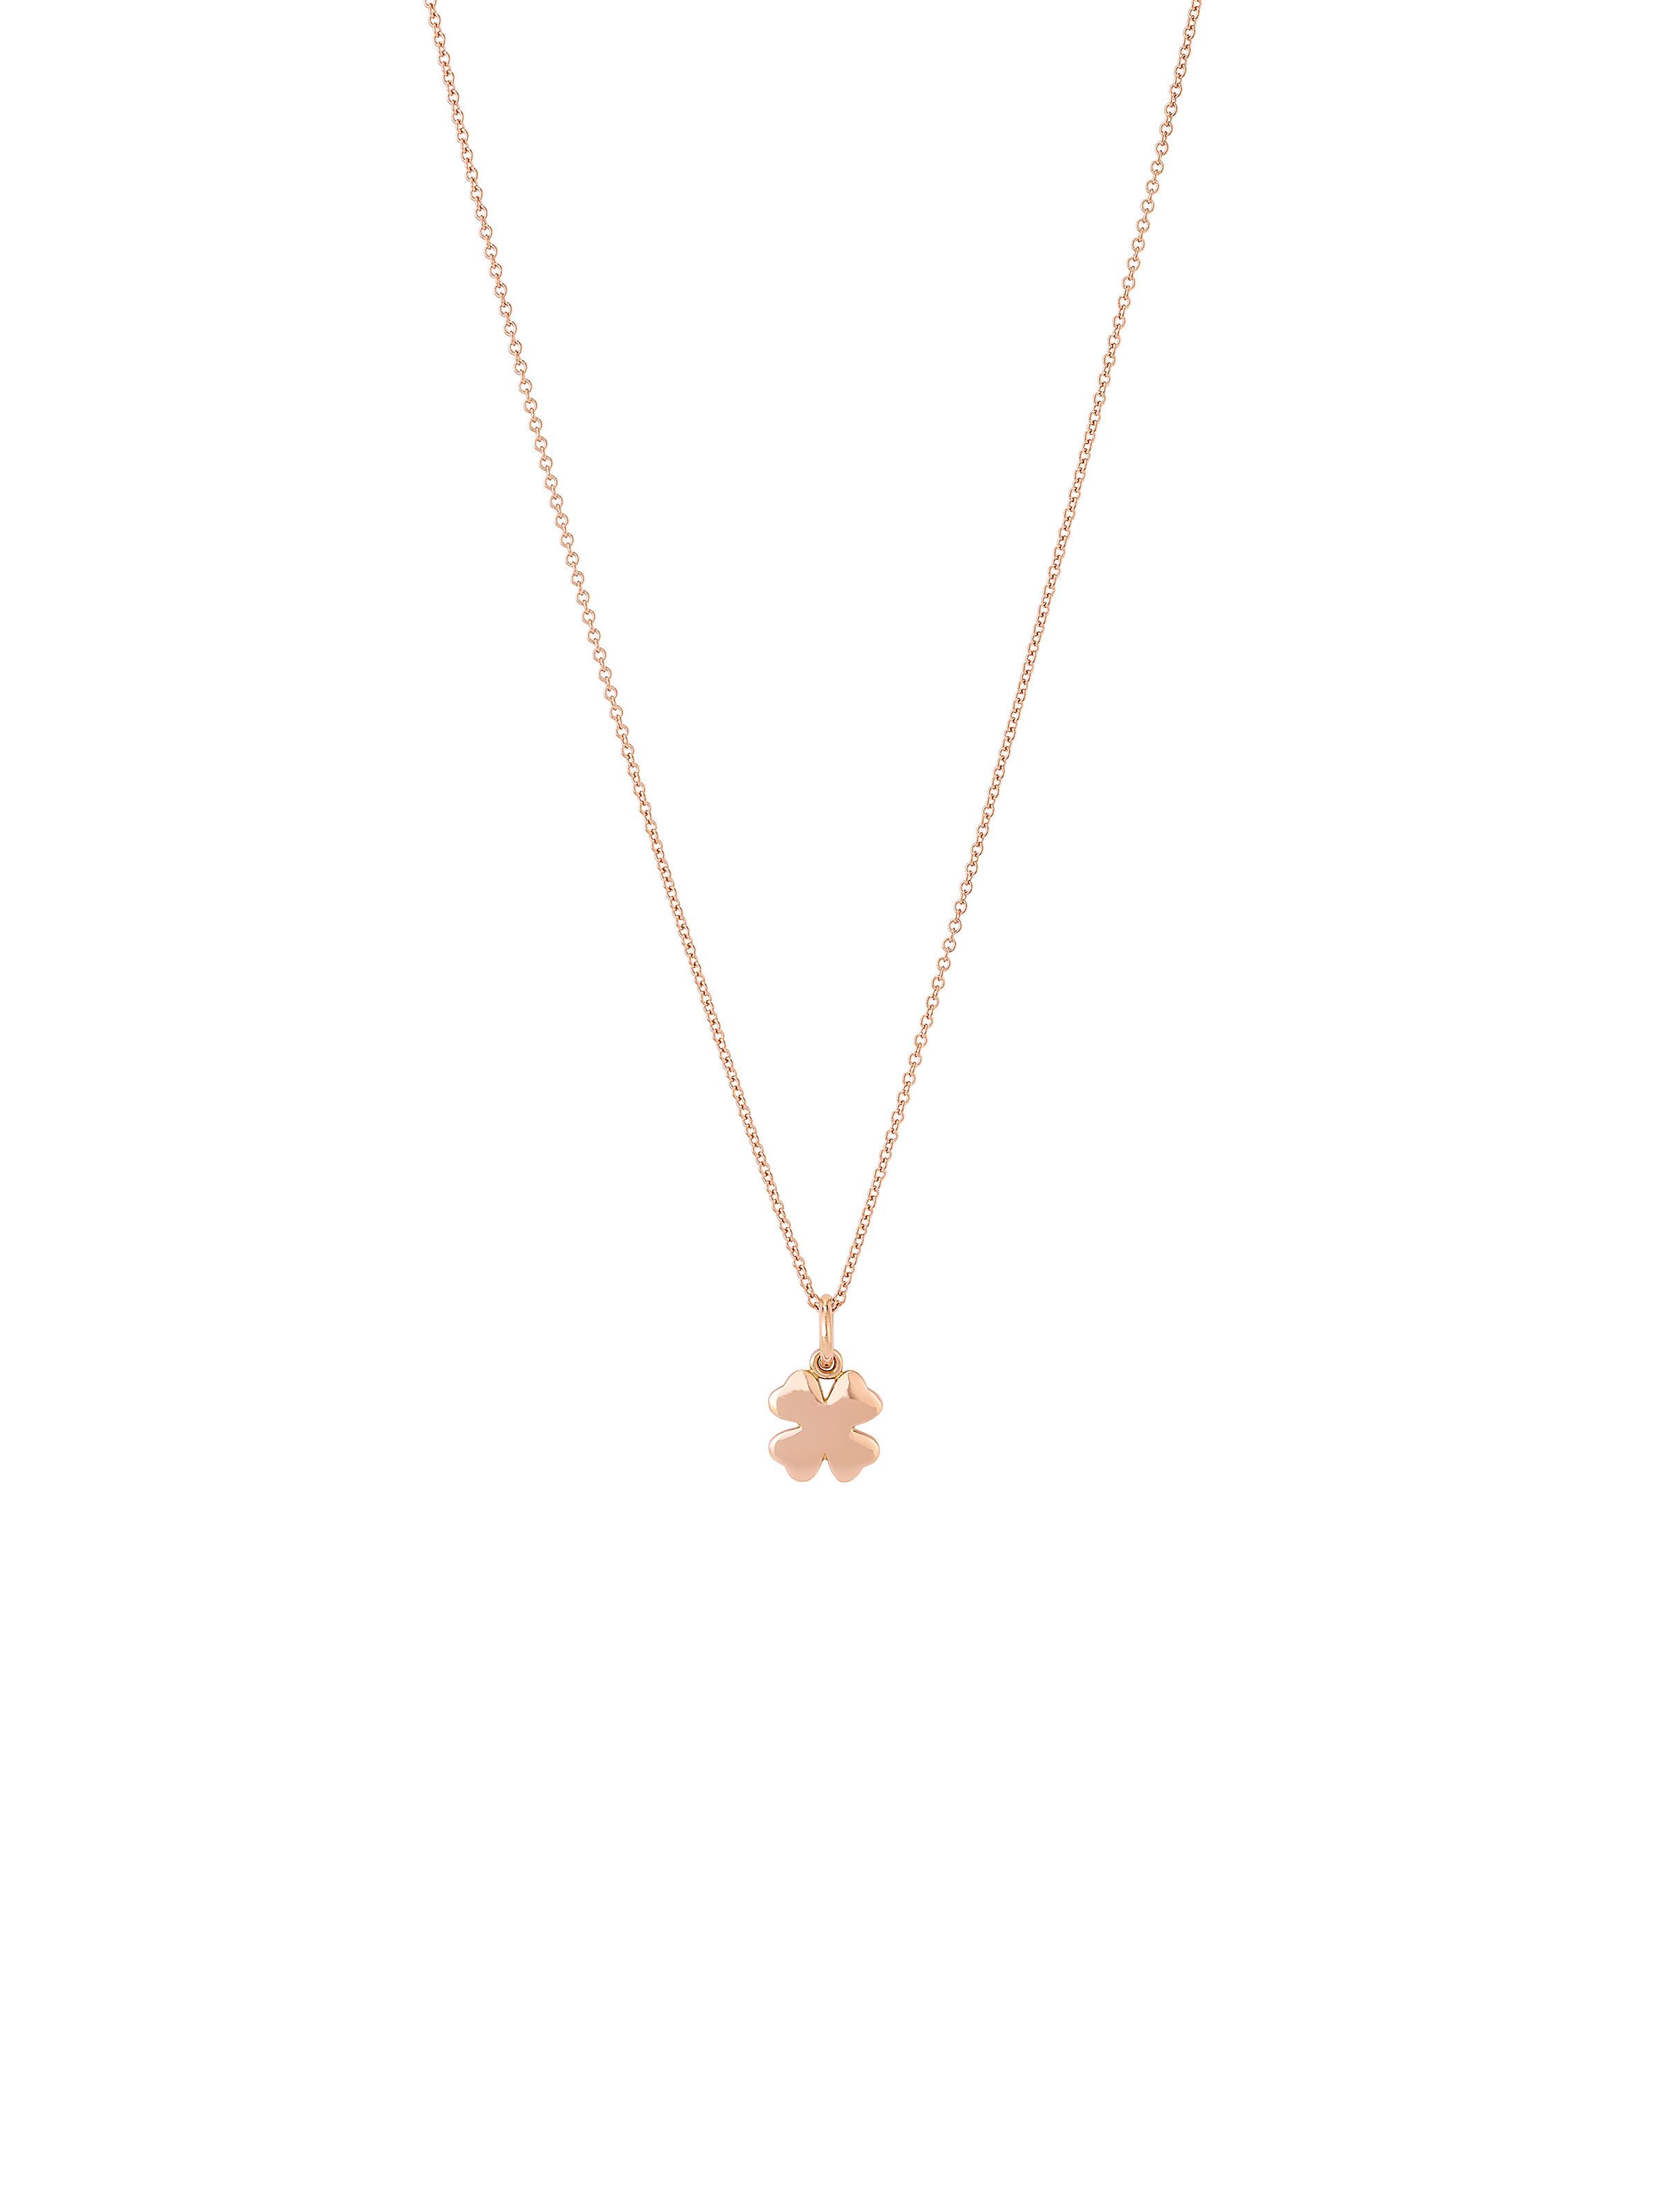 Cloverleaf pendant